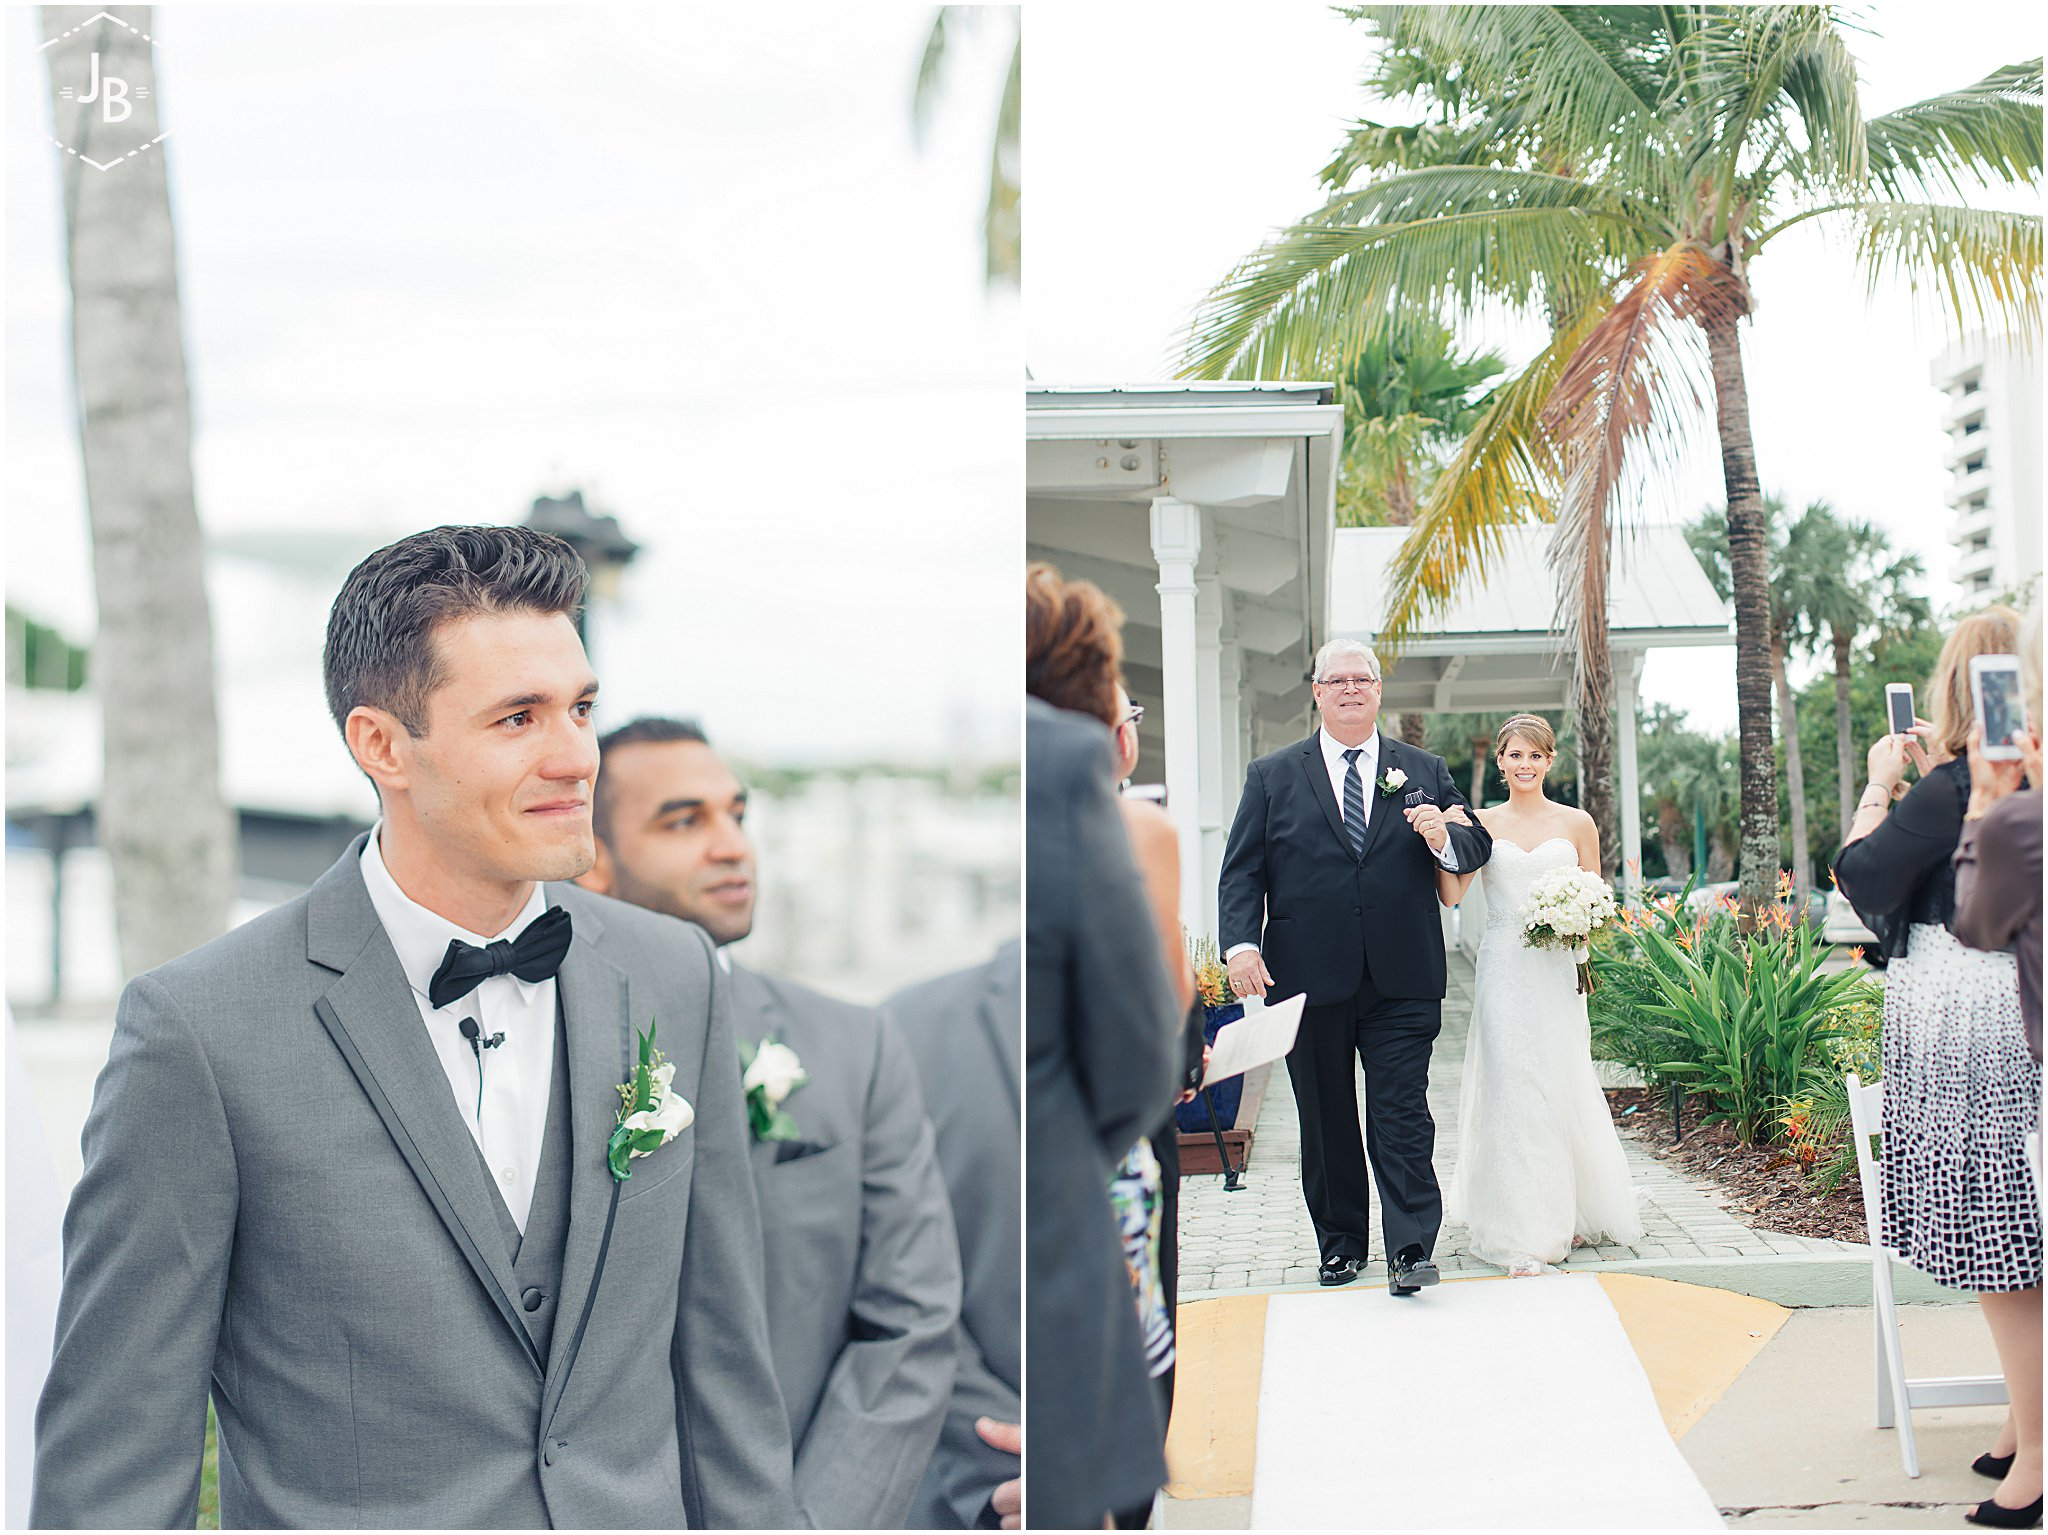 WeddingandEngagementFloridaPhotographer_0350.jpg